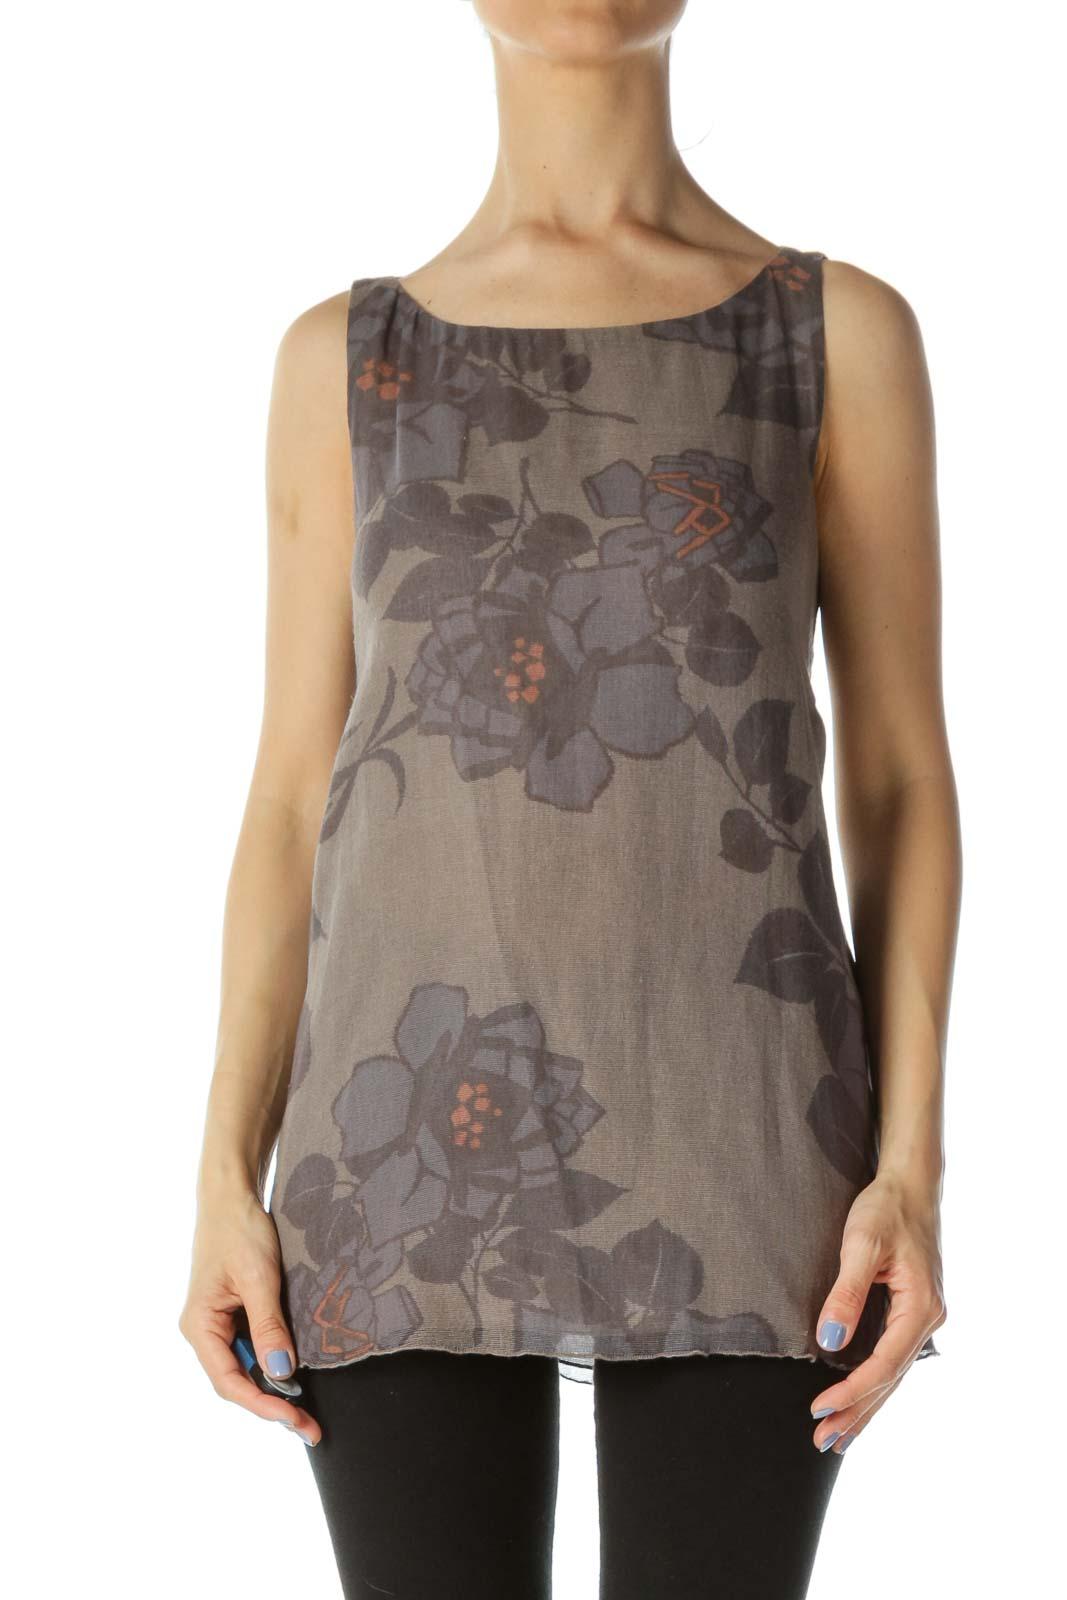 Gray/Blue/Beige 100% Cotton Sleeveless Flower-Print Knit Top Front